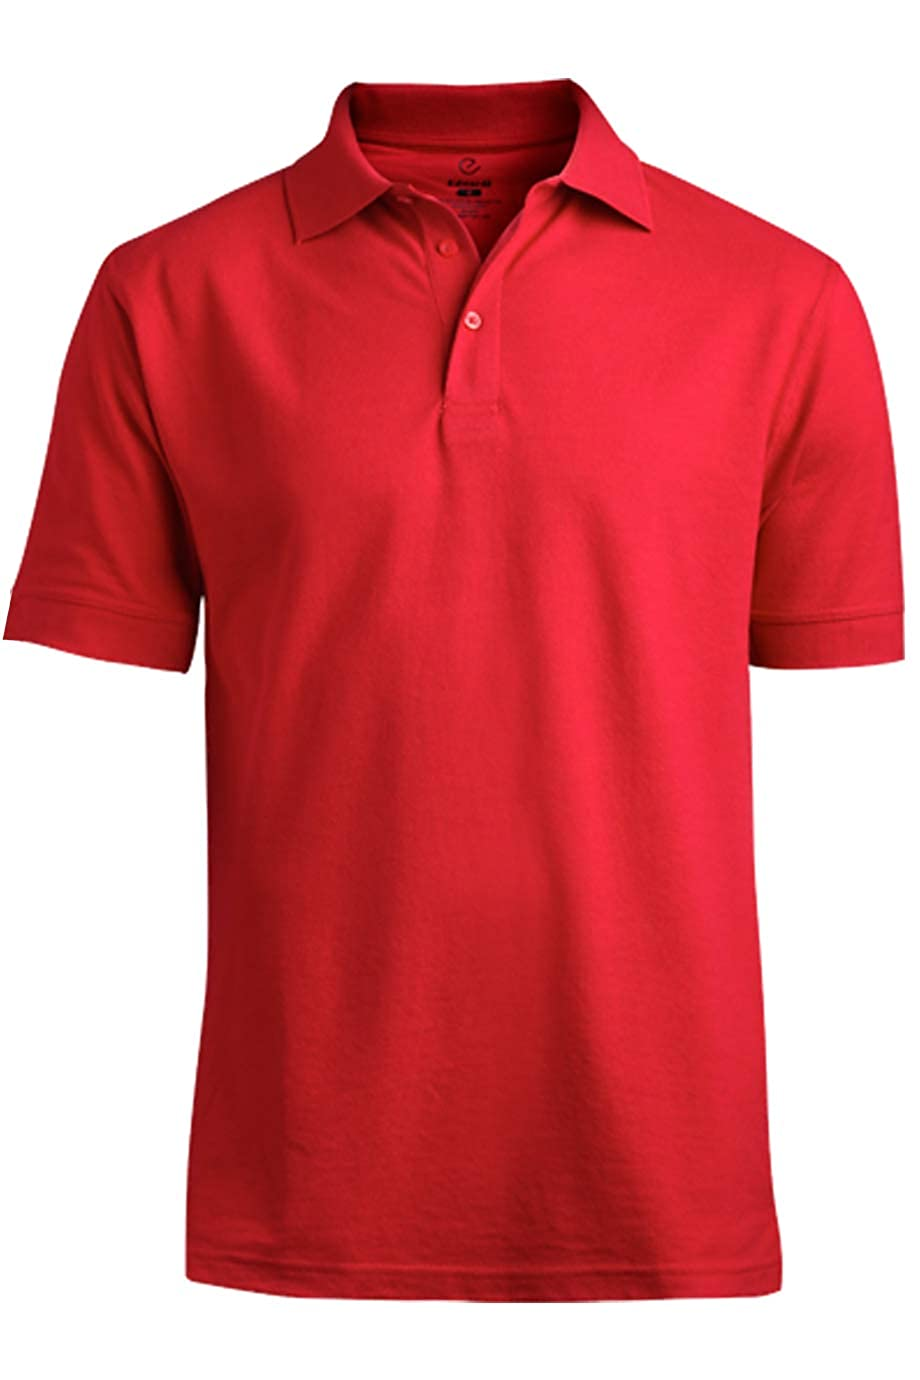 Edwards Mens Blended Pique Short Sleeve Polo